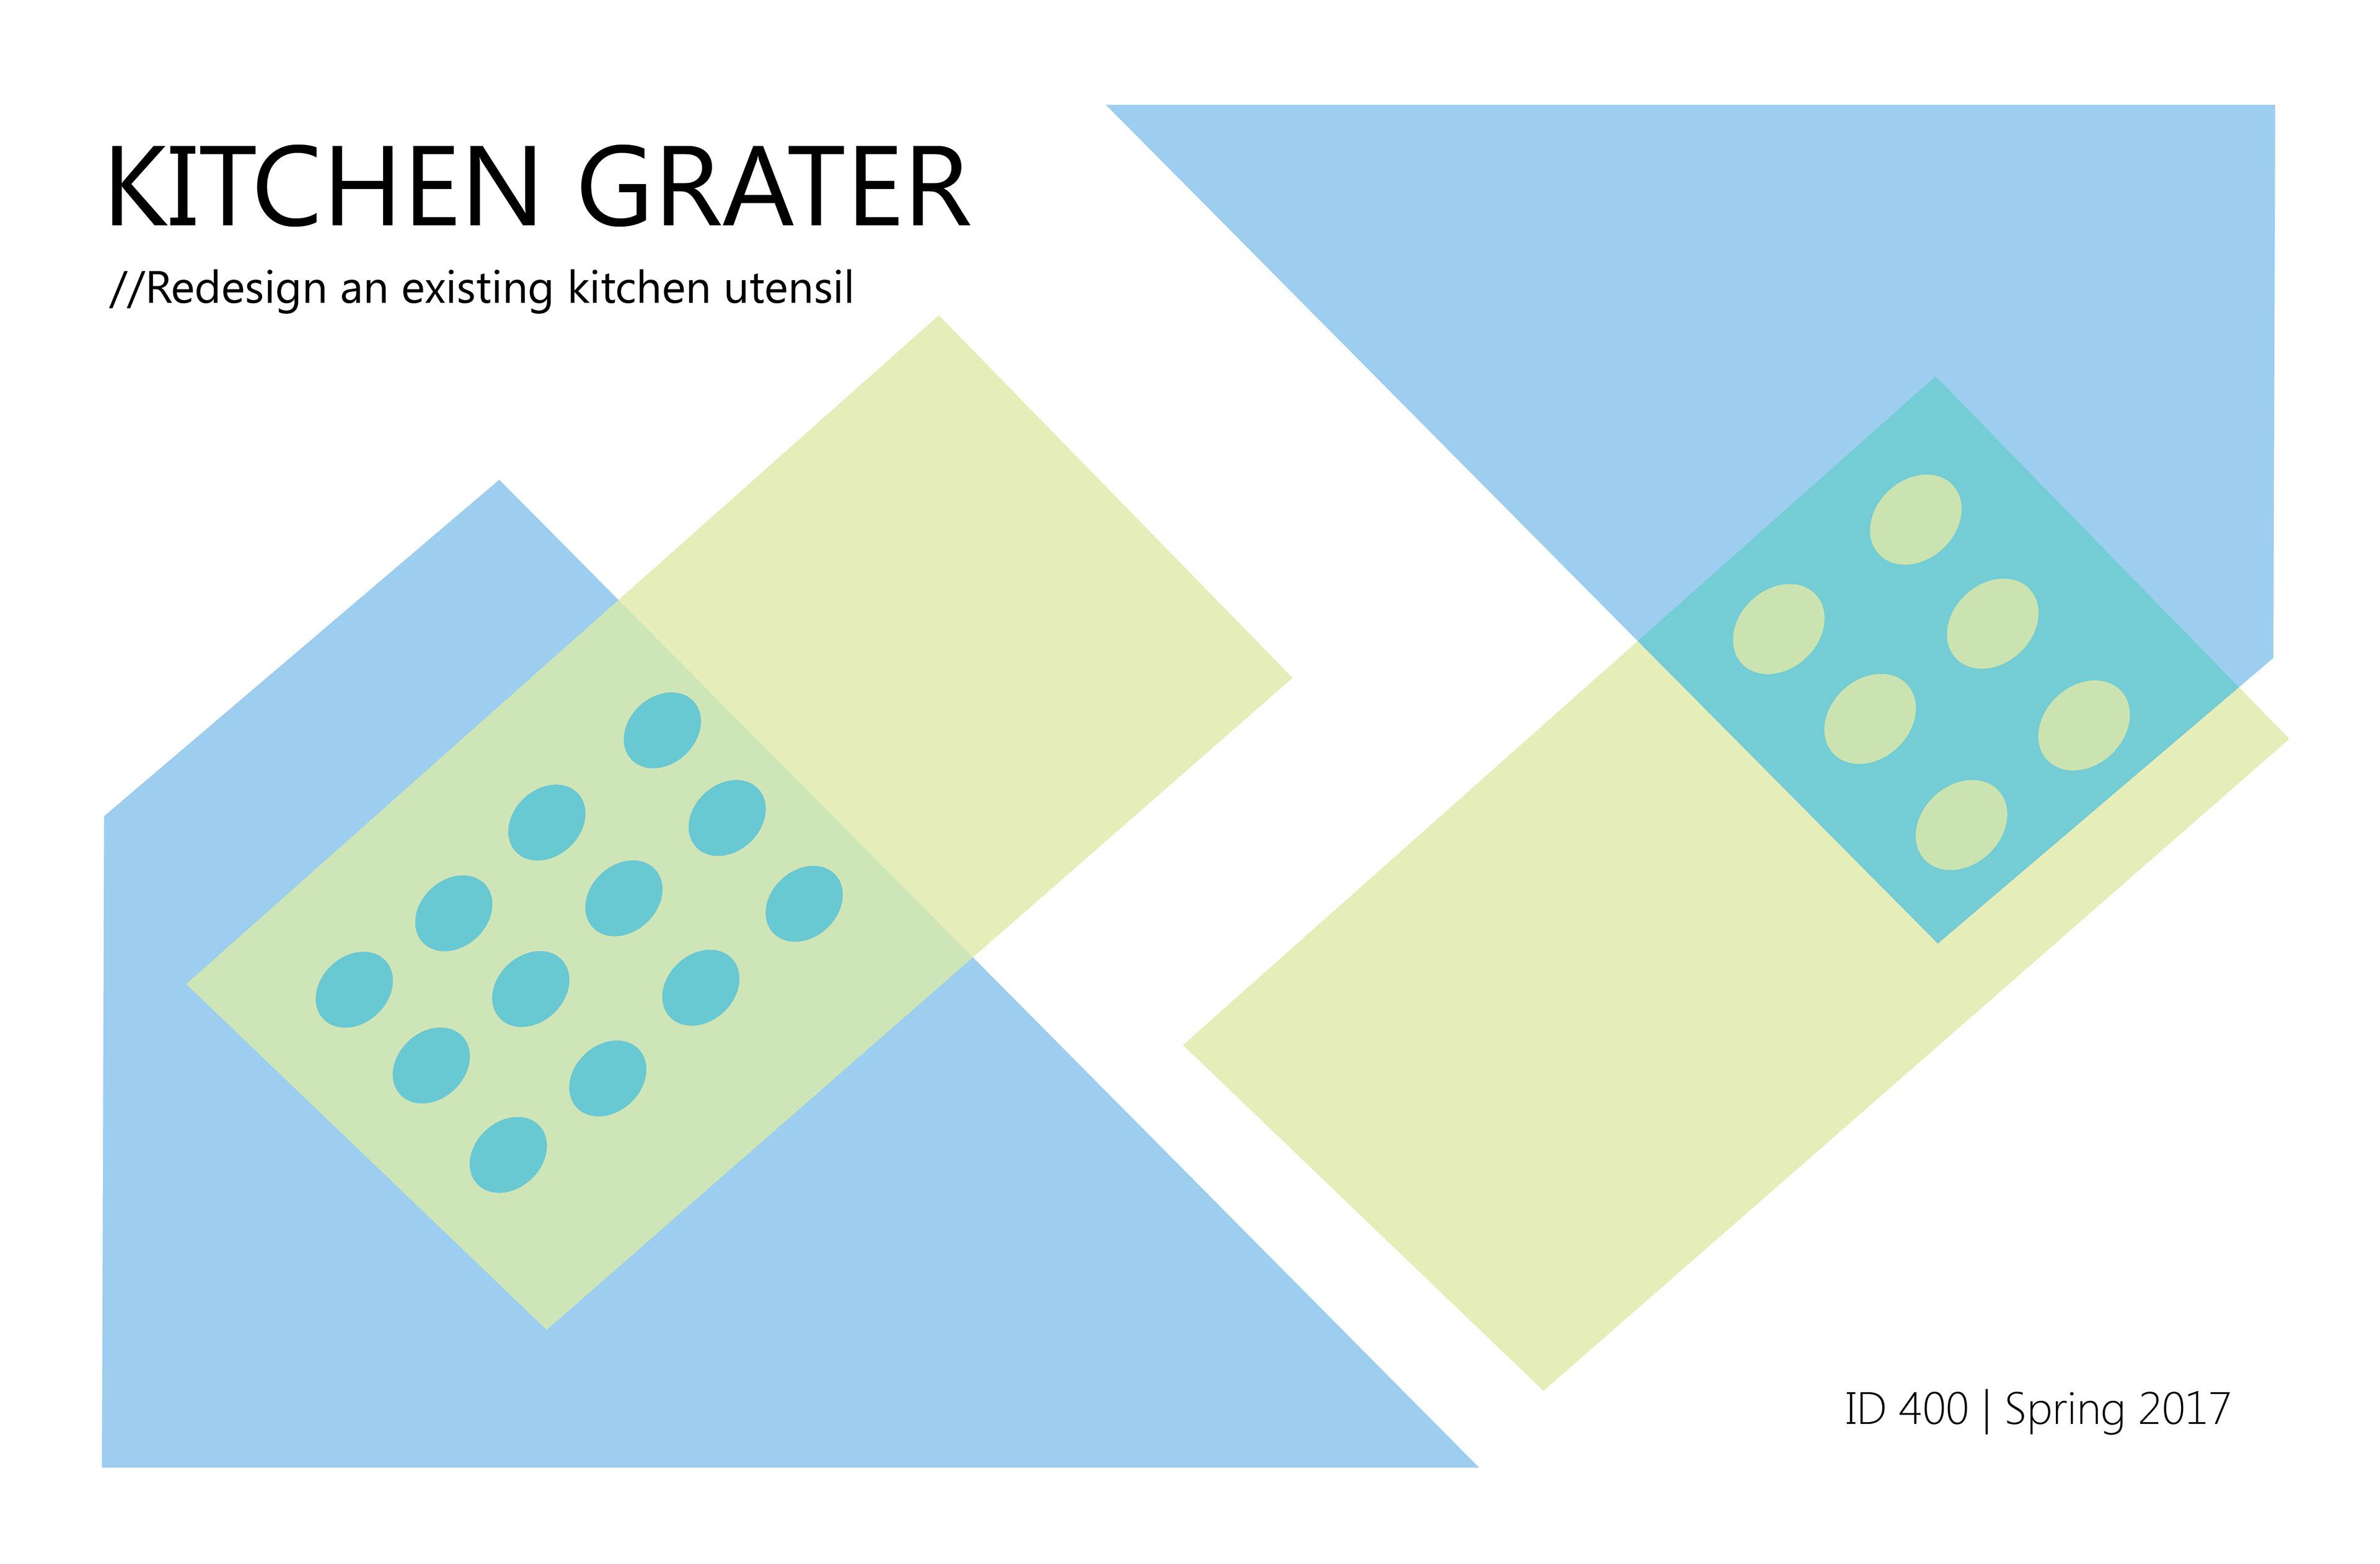 zester amazon turquoise and pin aqua com dining kitchenaid kitchen grater fine